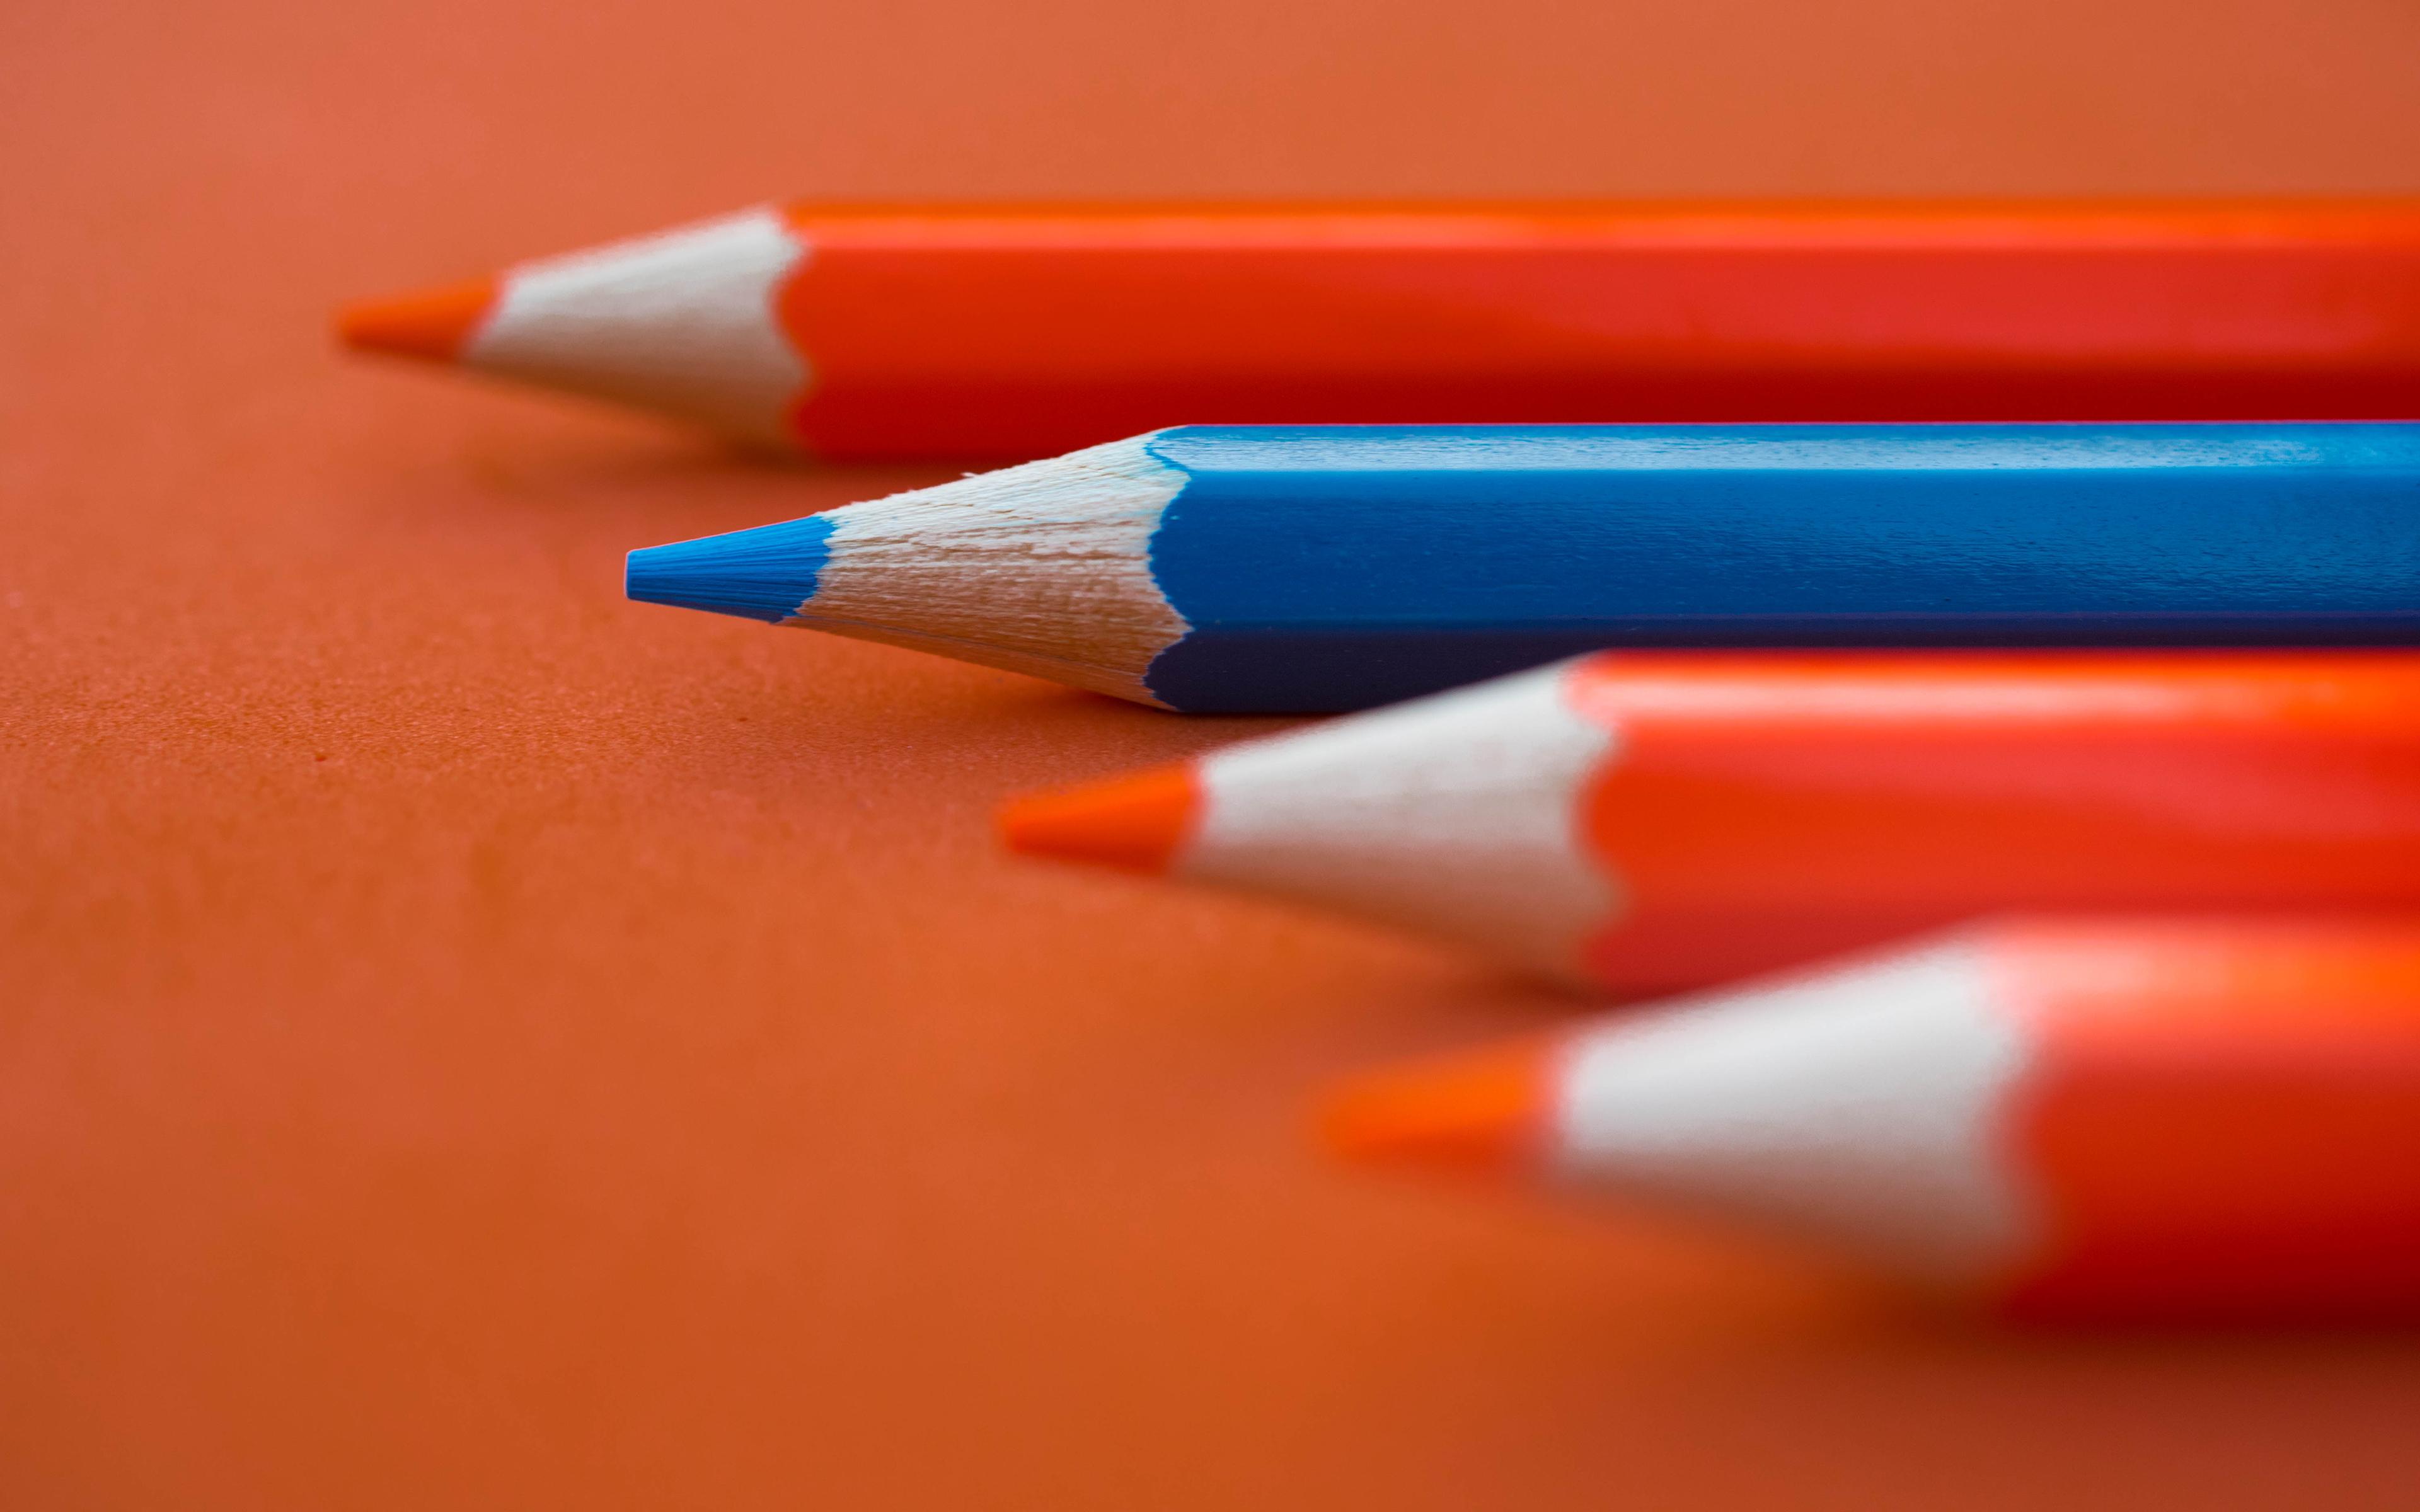 картинка оранжевого карандаша съехались